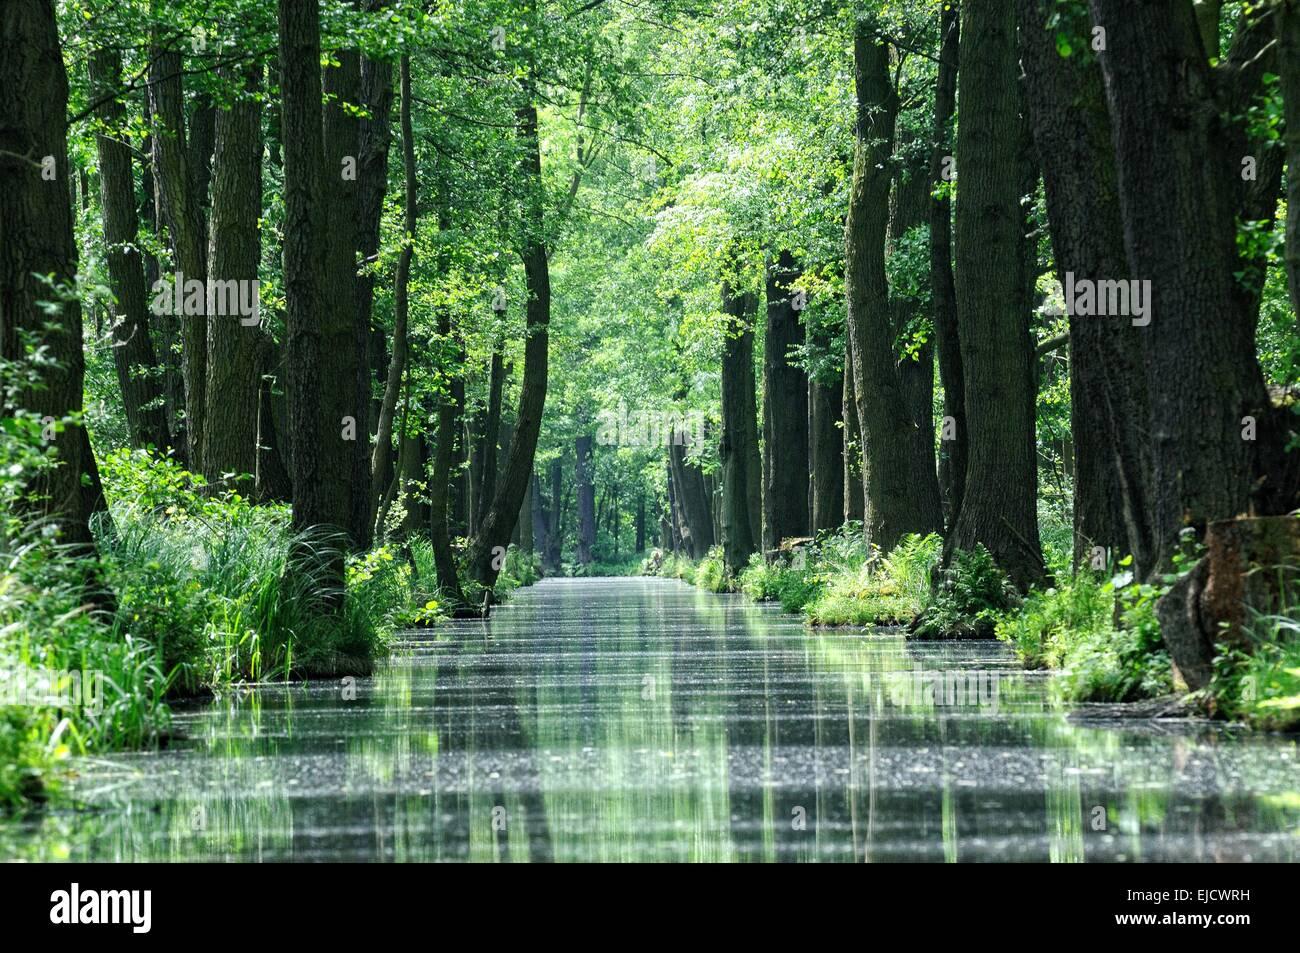 New Spree Burg-Kauper-Leipe Spreewald forest Stock Photo